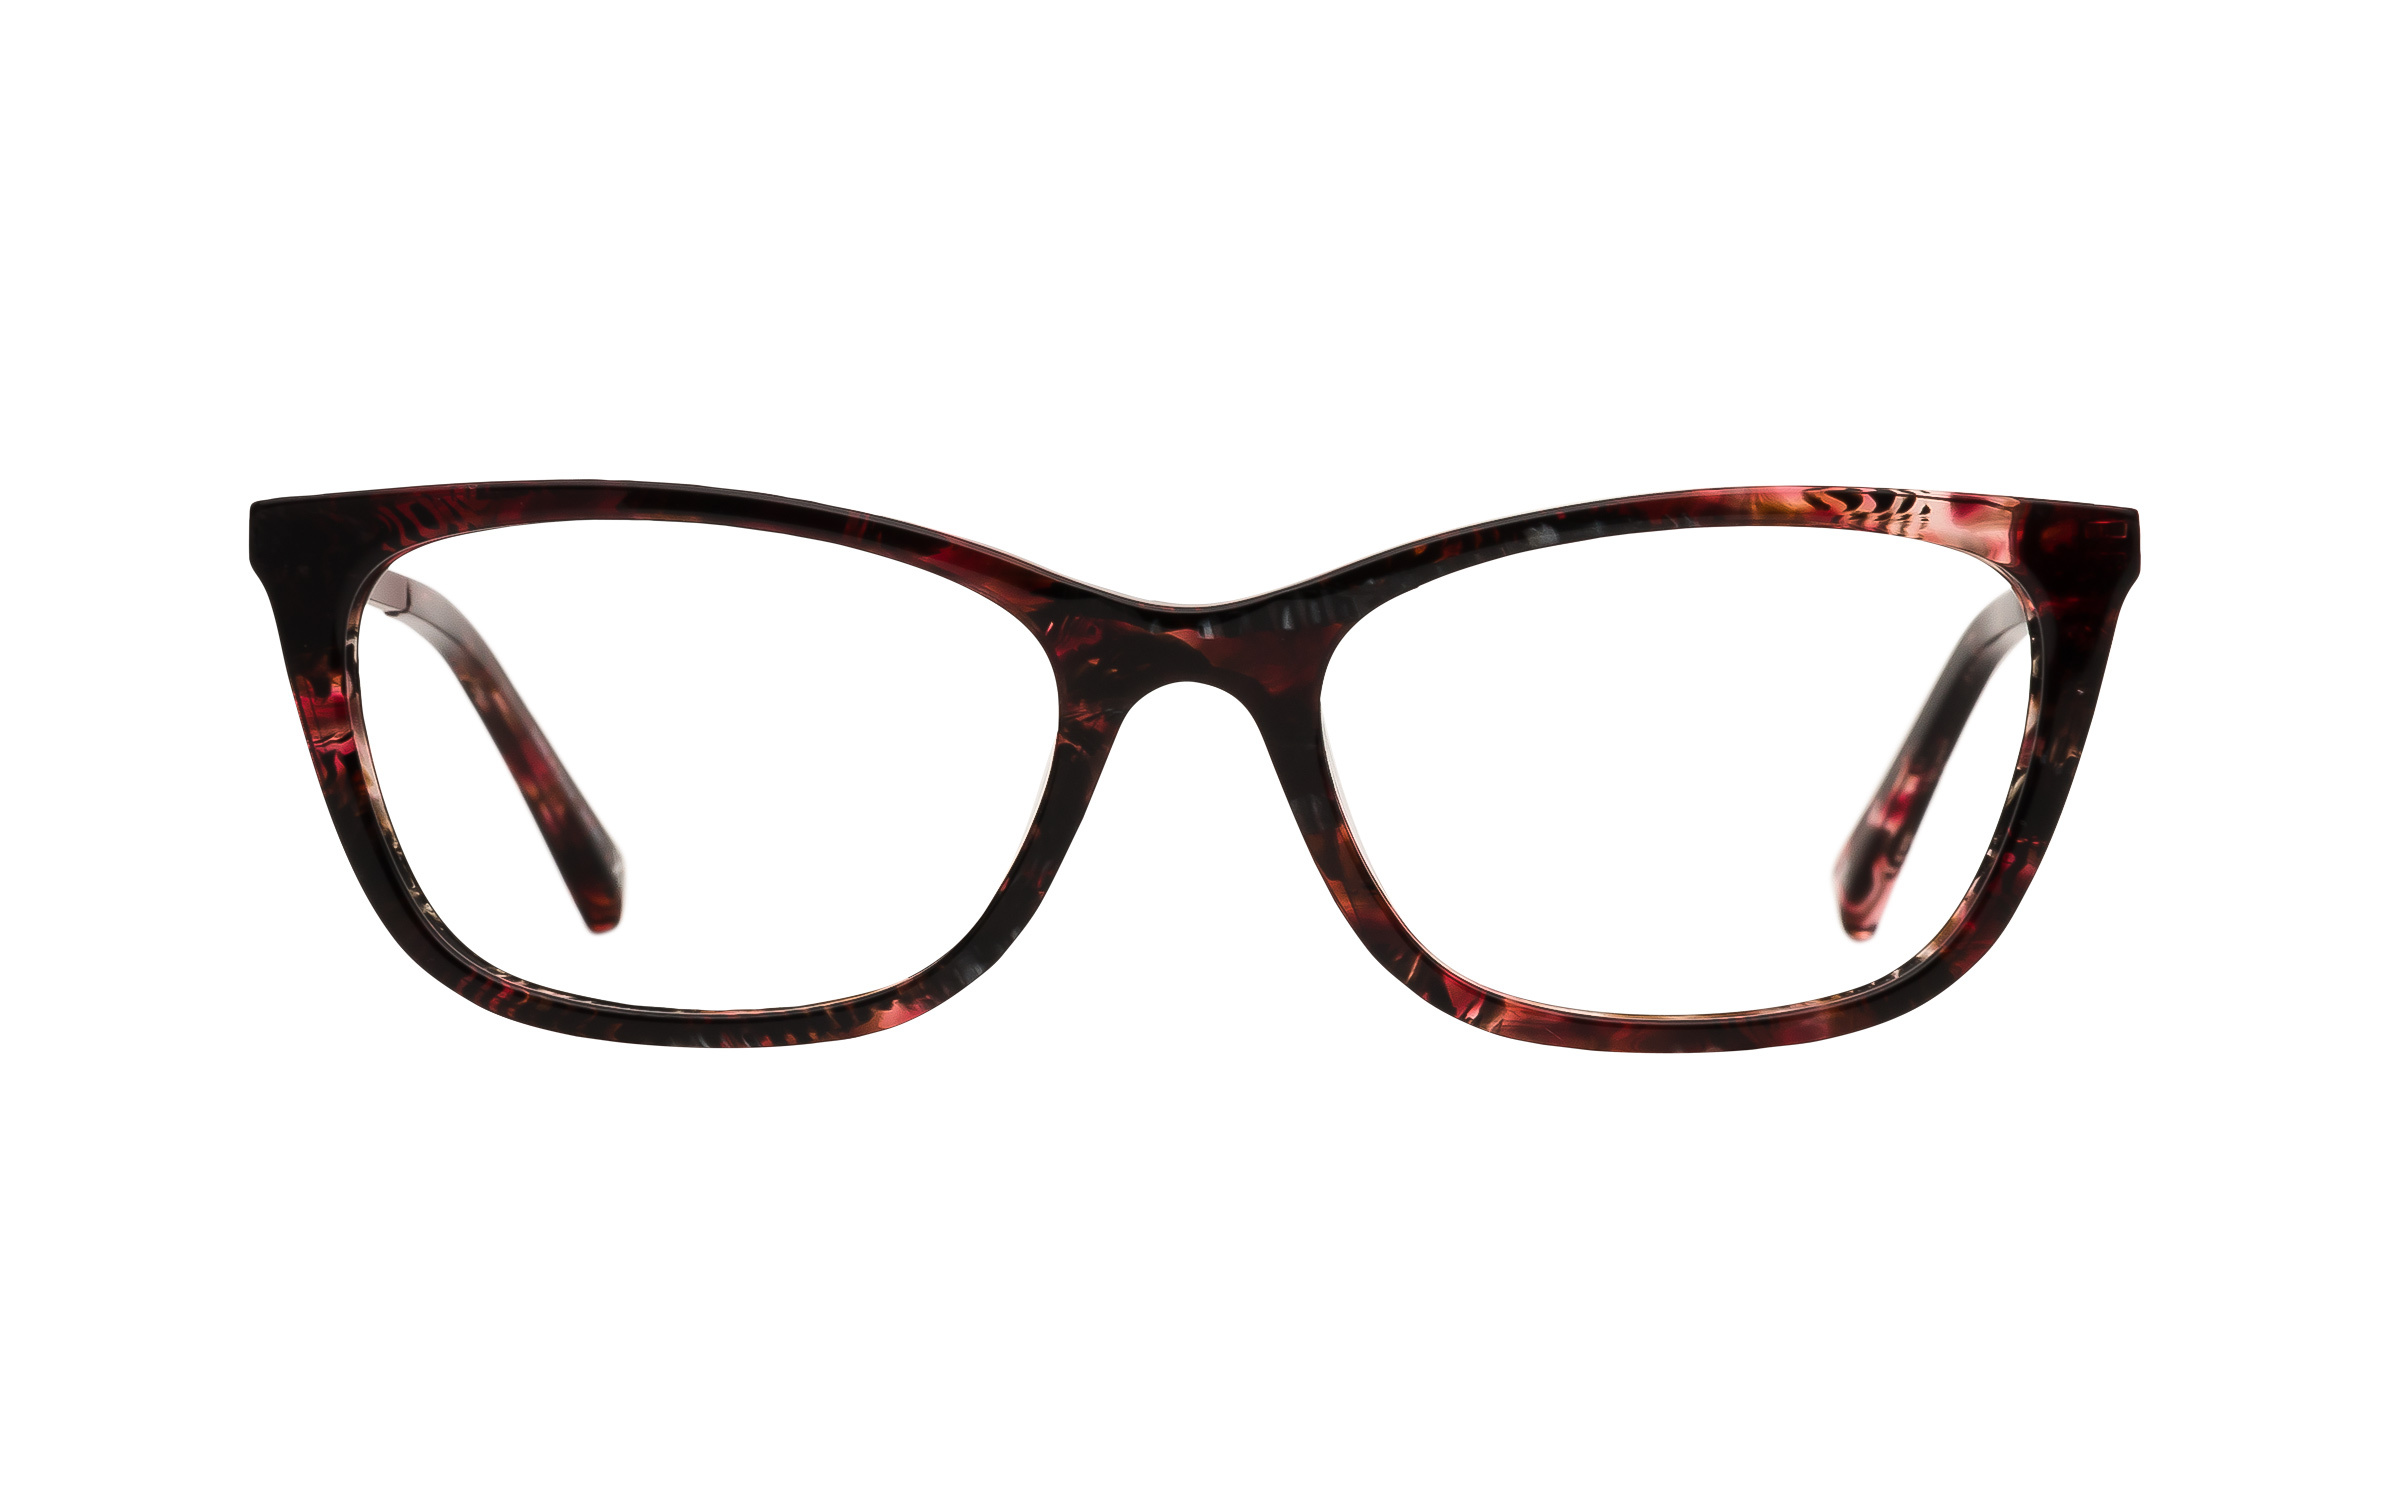 Women's Red D-Frame Derek Cardigan Glasses - Clearly Glasses Online